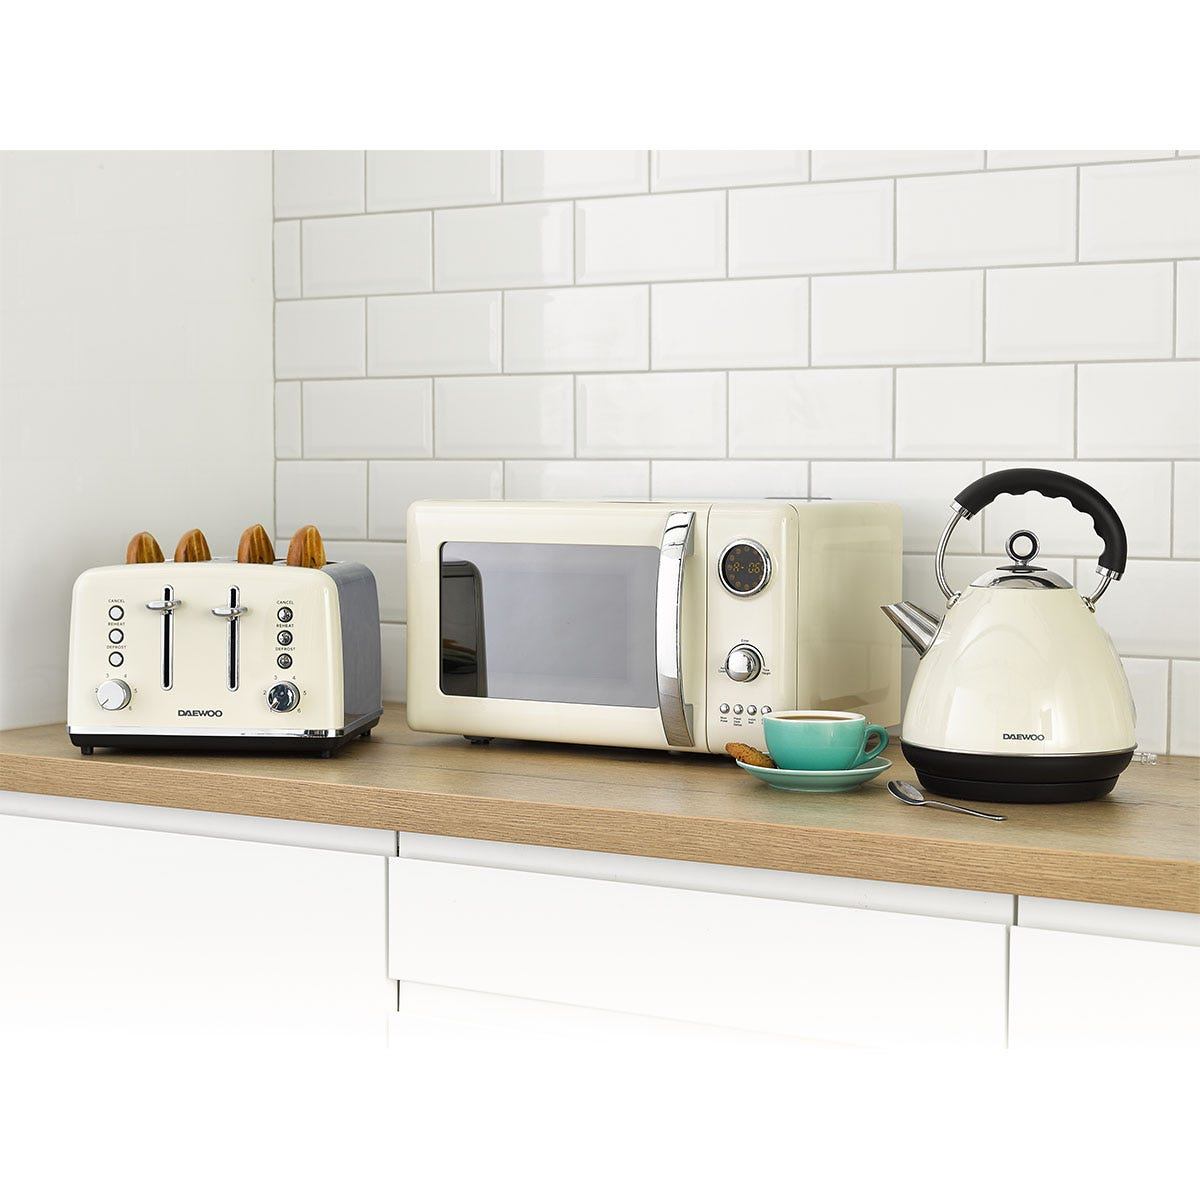 Daewoo SDA2426DS Kensington 1.7L Pyramid Kettle, 4-Slice Toaster, and 20L Digital Microwave Bundle - Cream